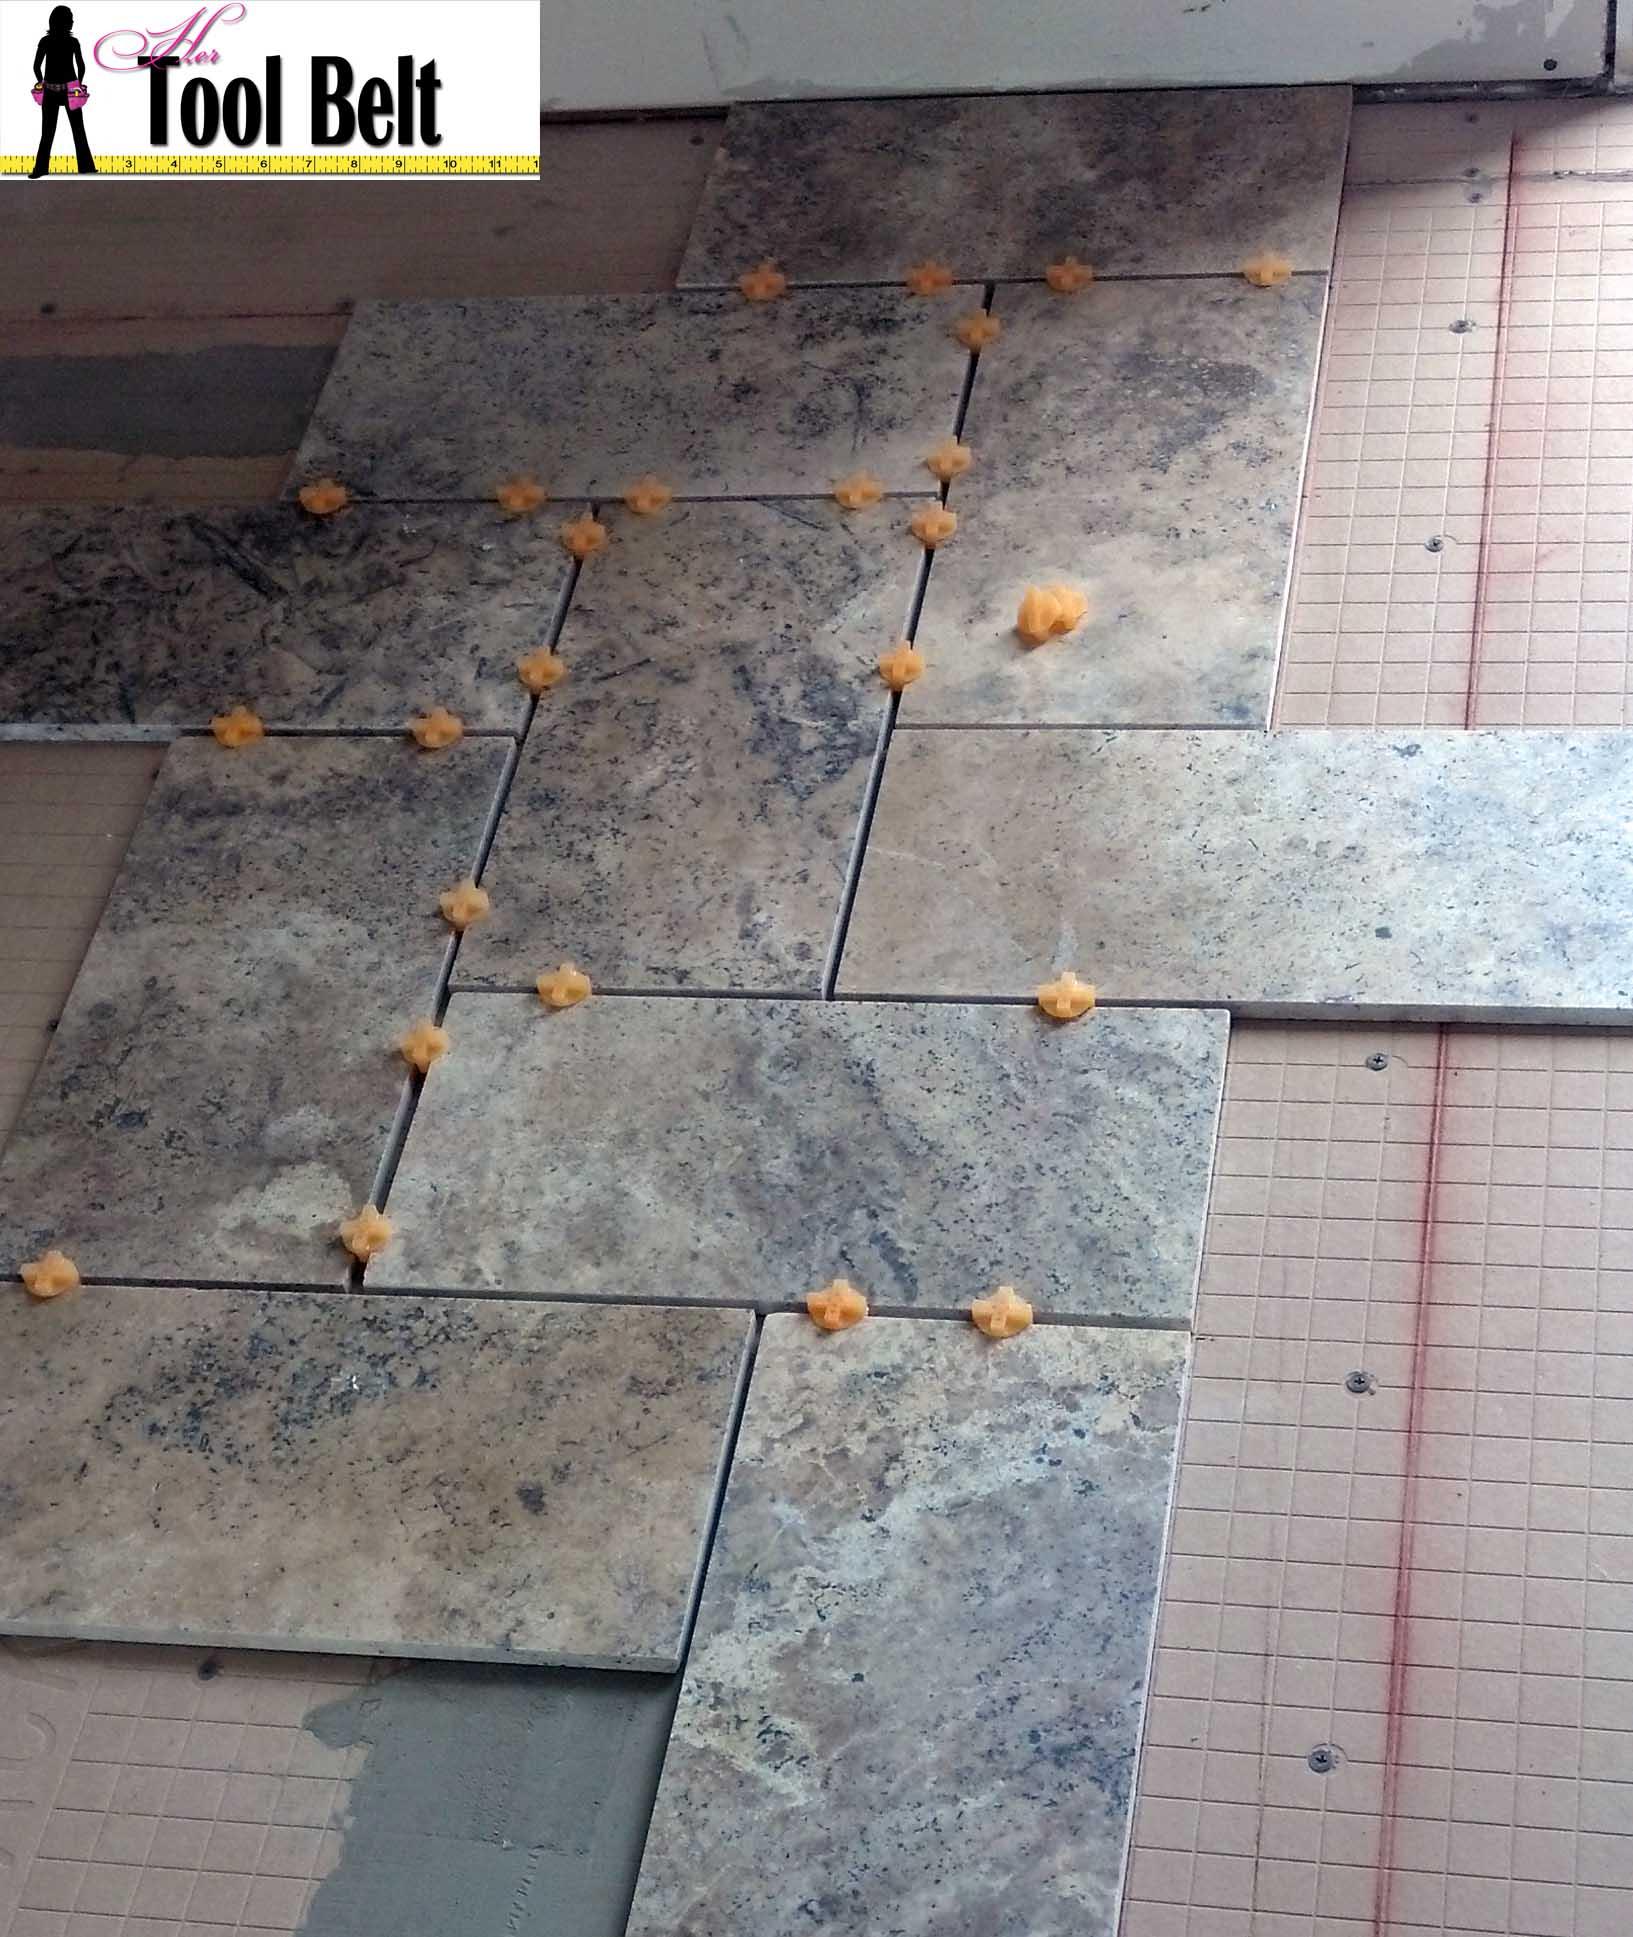 Greatest Silver Travertine Tile Herringbone Floor Tutorial - Her Tool Belt TG88